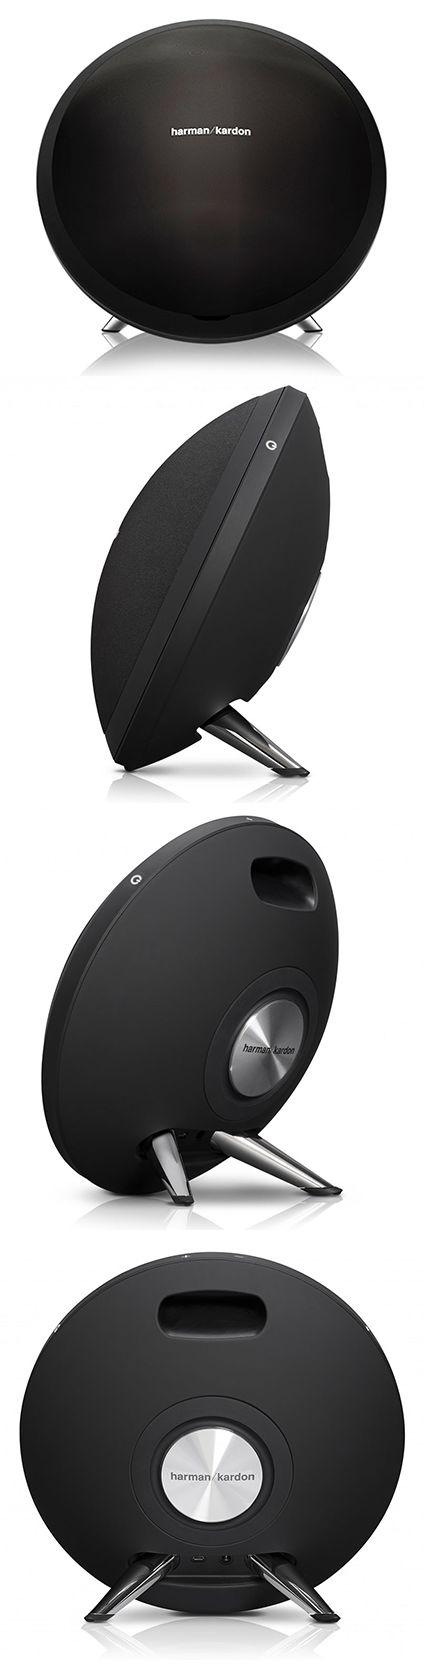 Harman Kardon Onyx Studio Wireless Bluetooth Speaker in Black